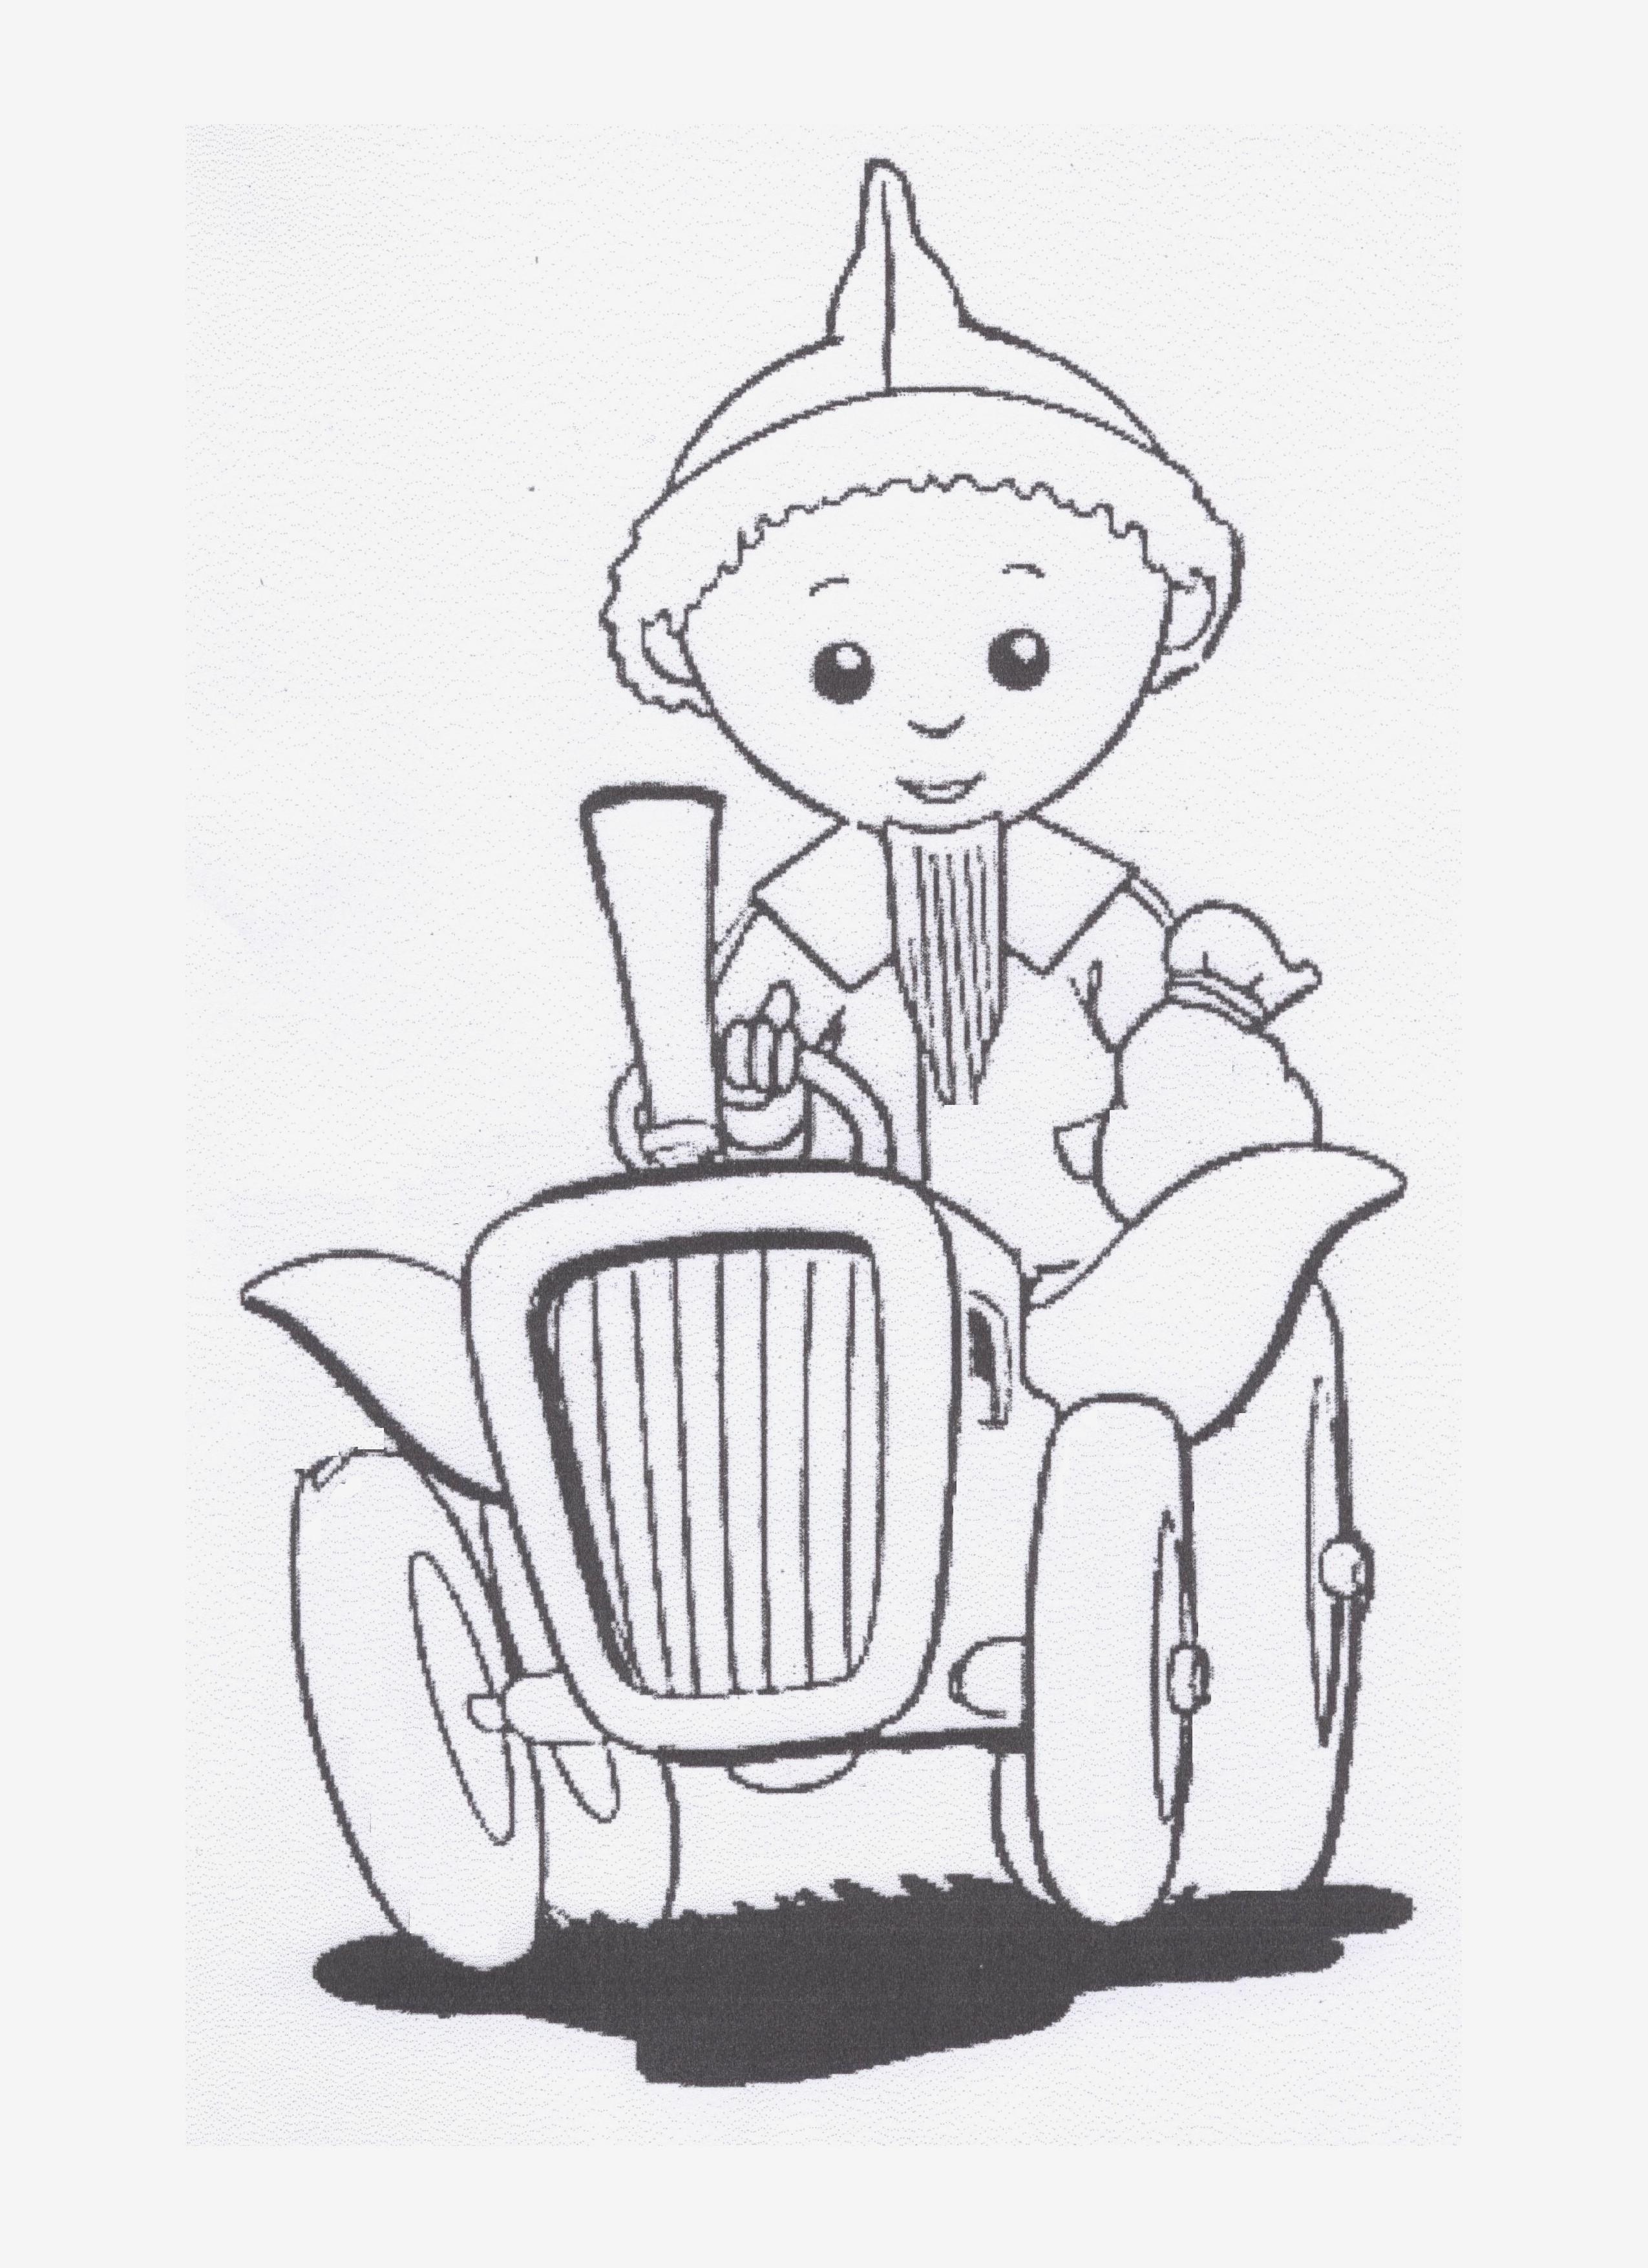 Ausmalbilder Traktor Mit Pflug Genial 45 Fantastisch Ausmalbilder Traktor Fendt – Große Coloring Page Sammlung Galerie